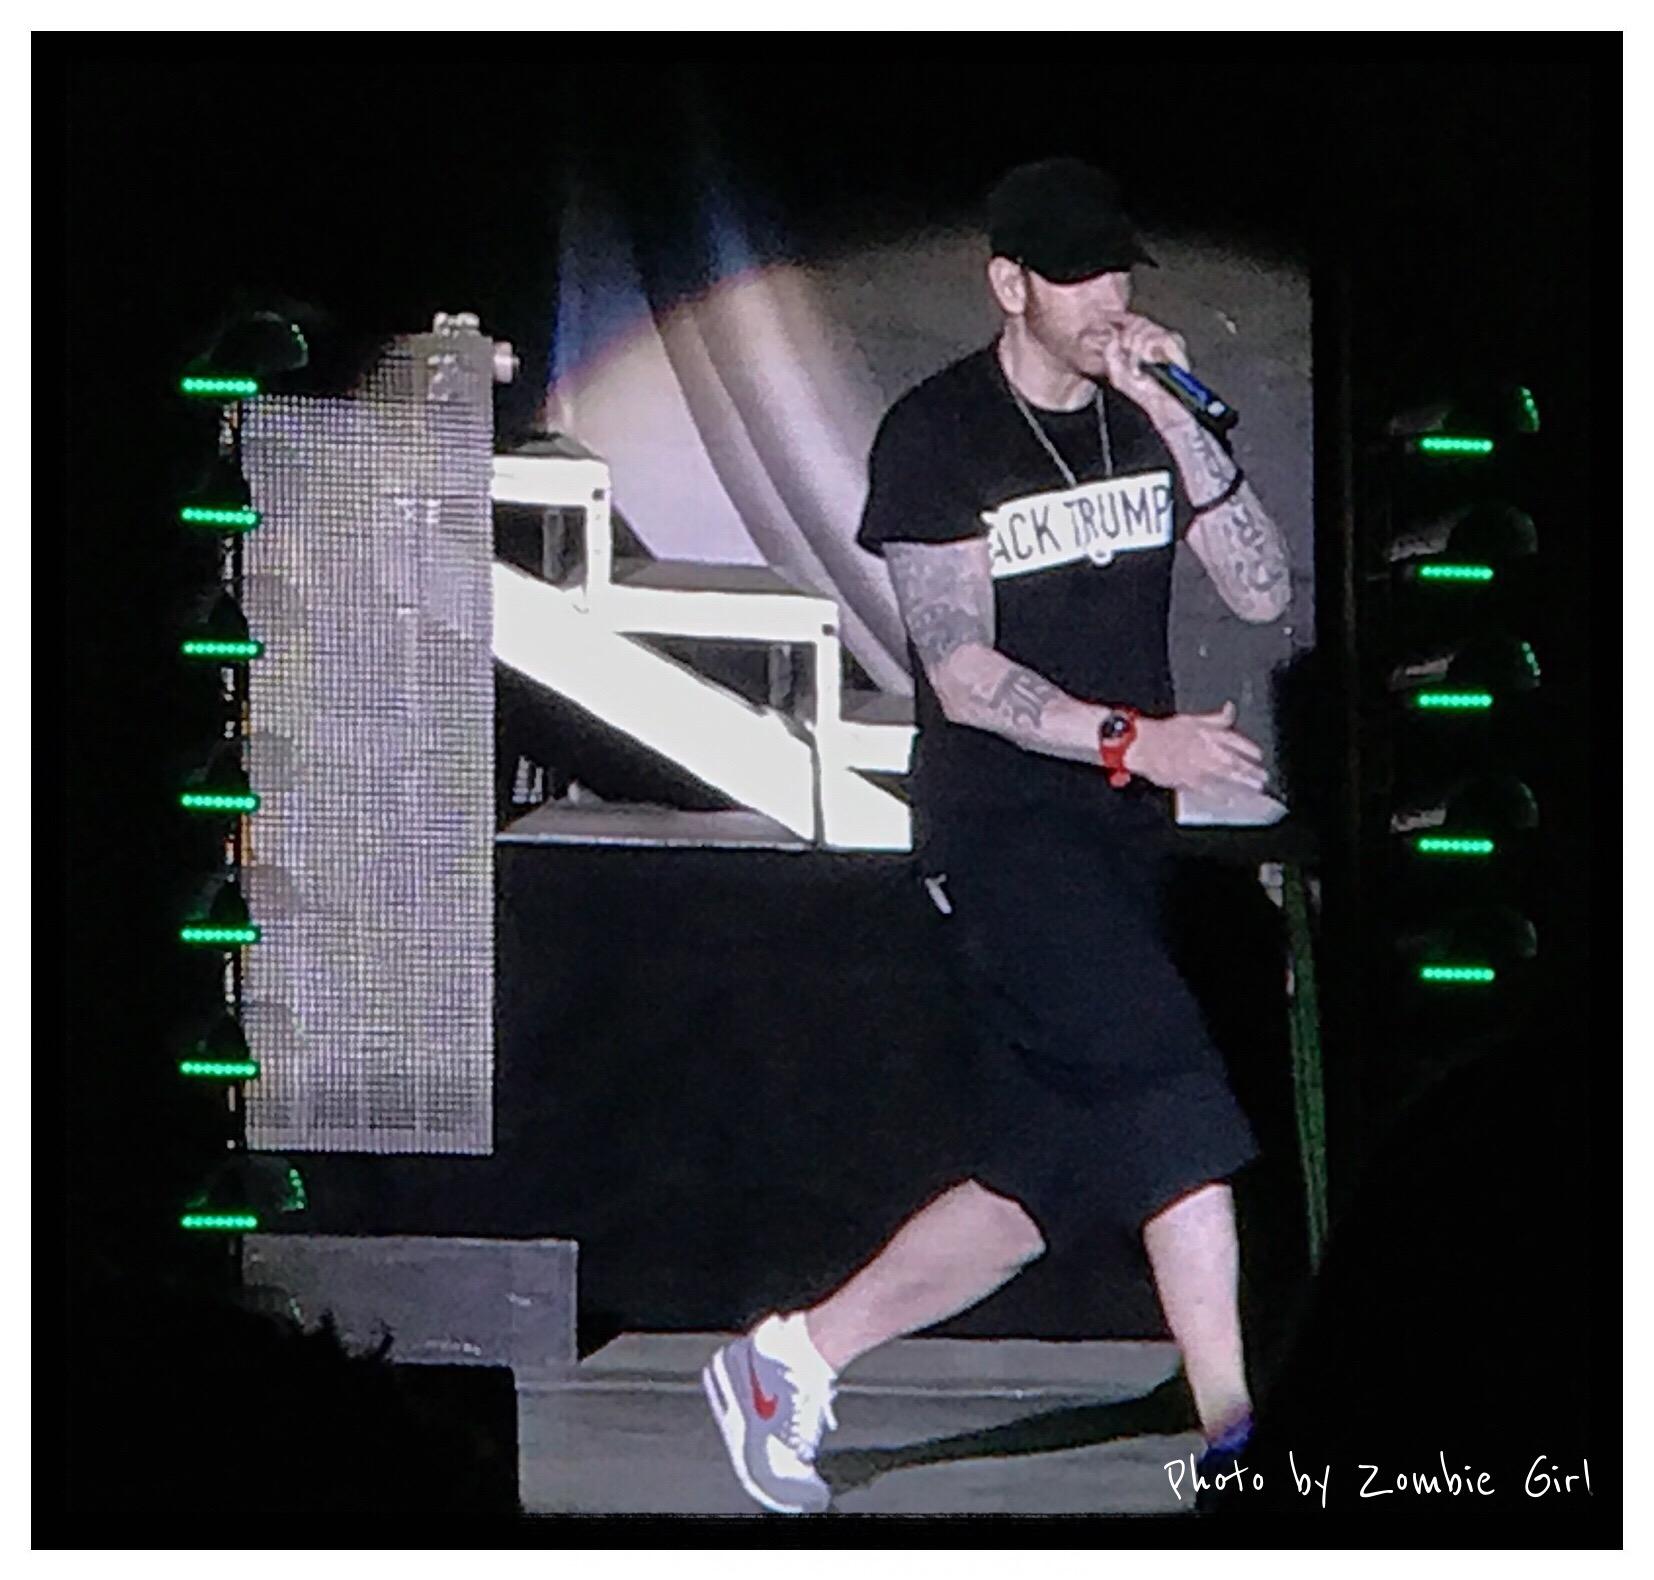 Eminem shares his political views at Leeds 2017